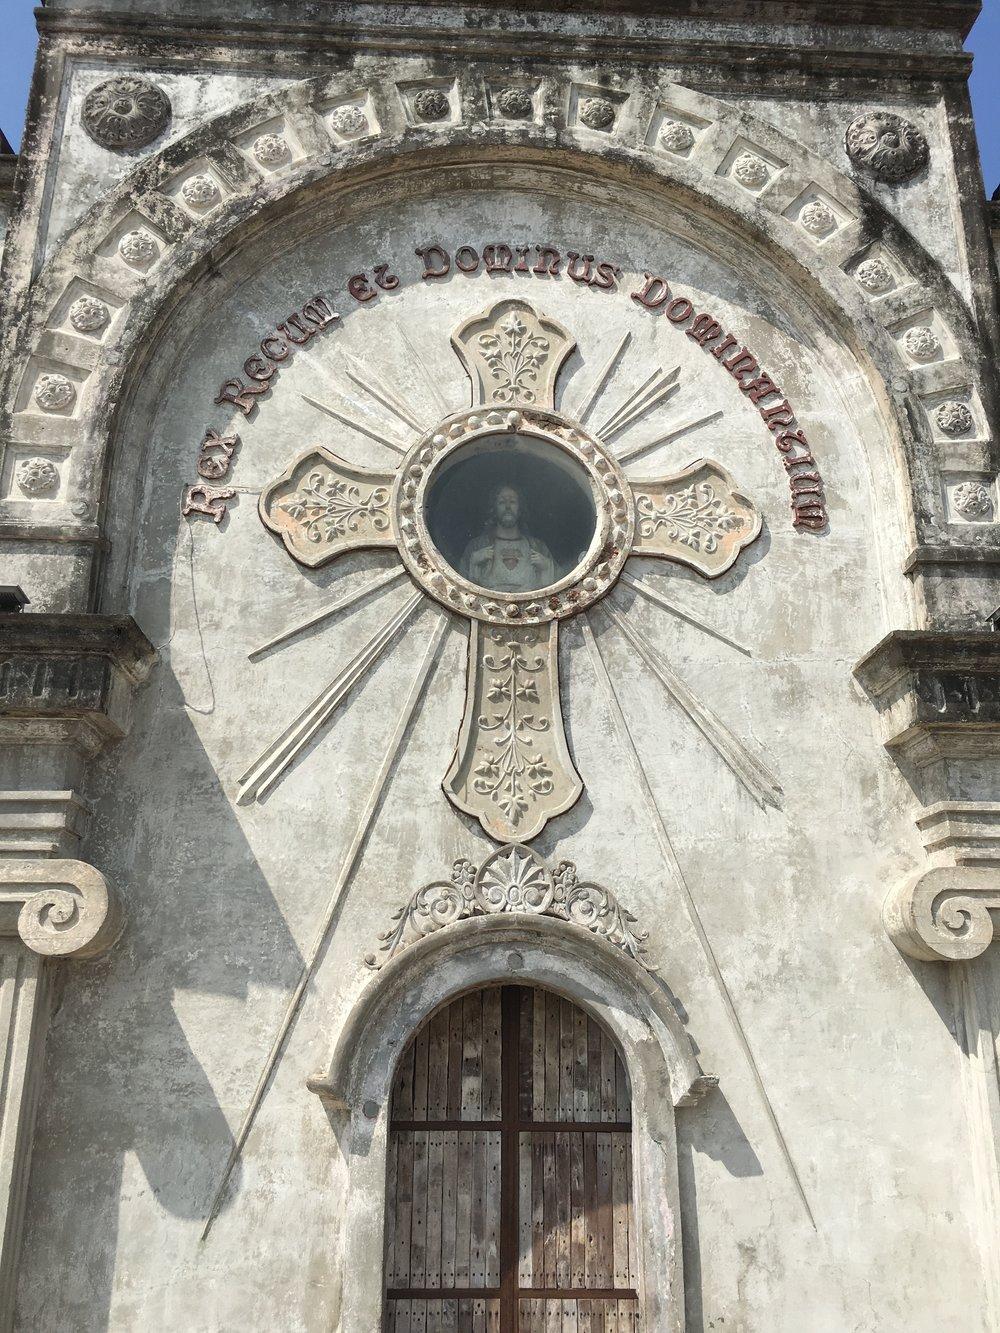 Closer View of Church